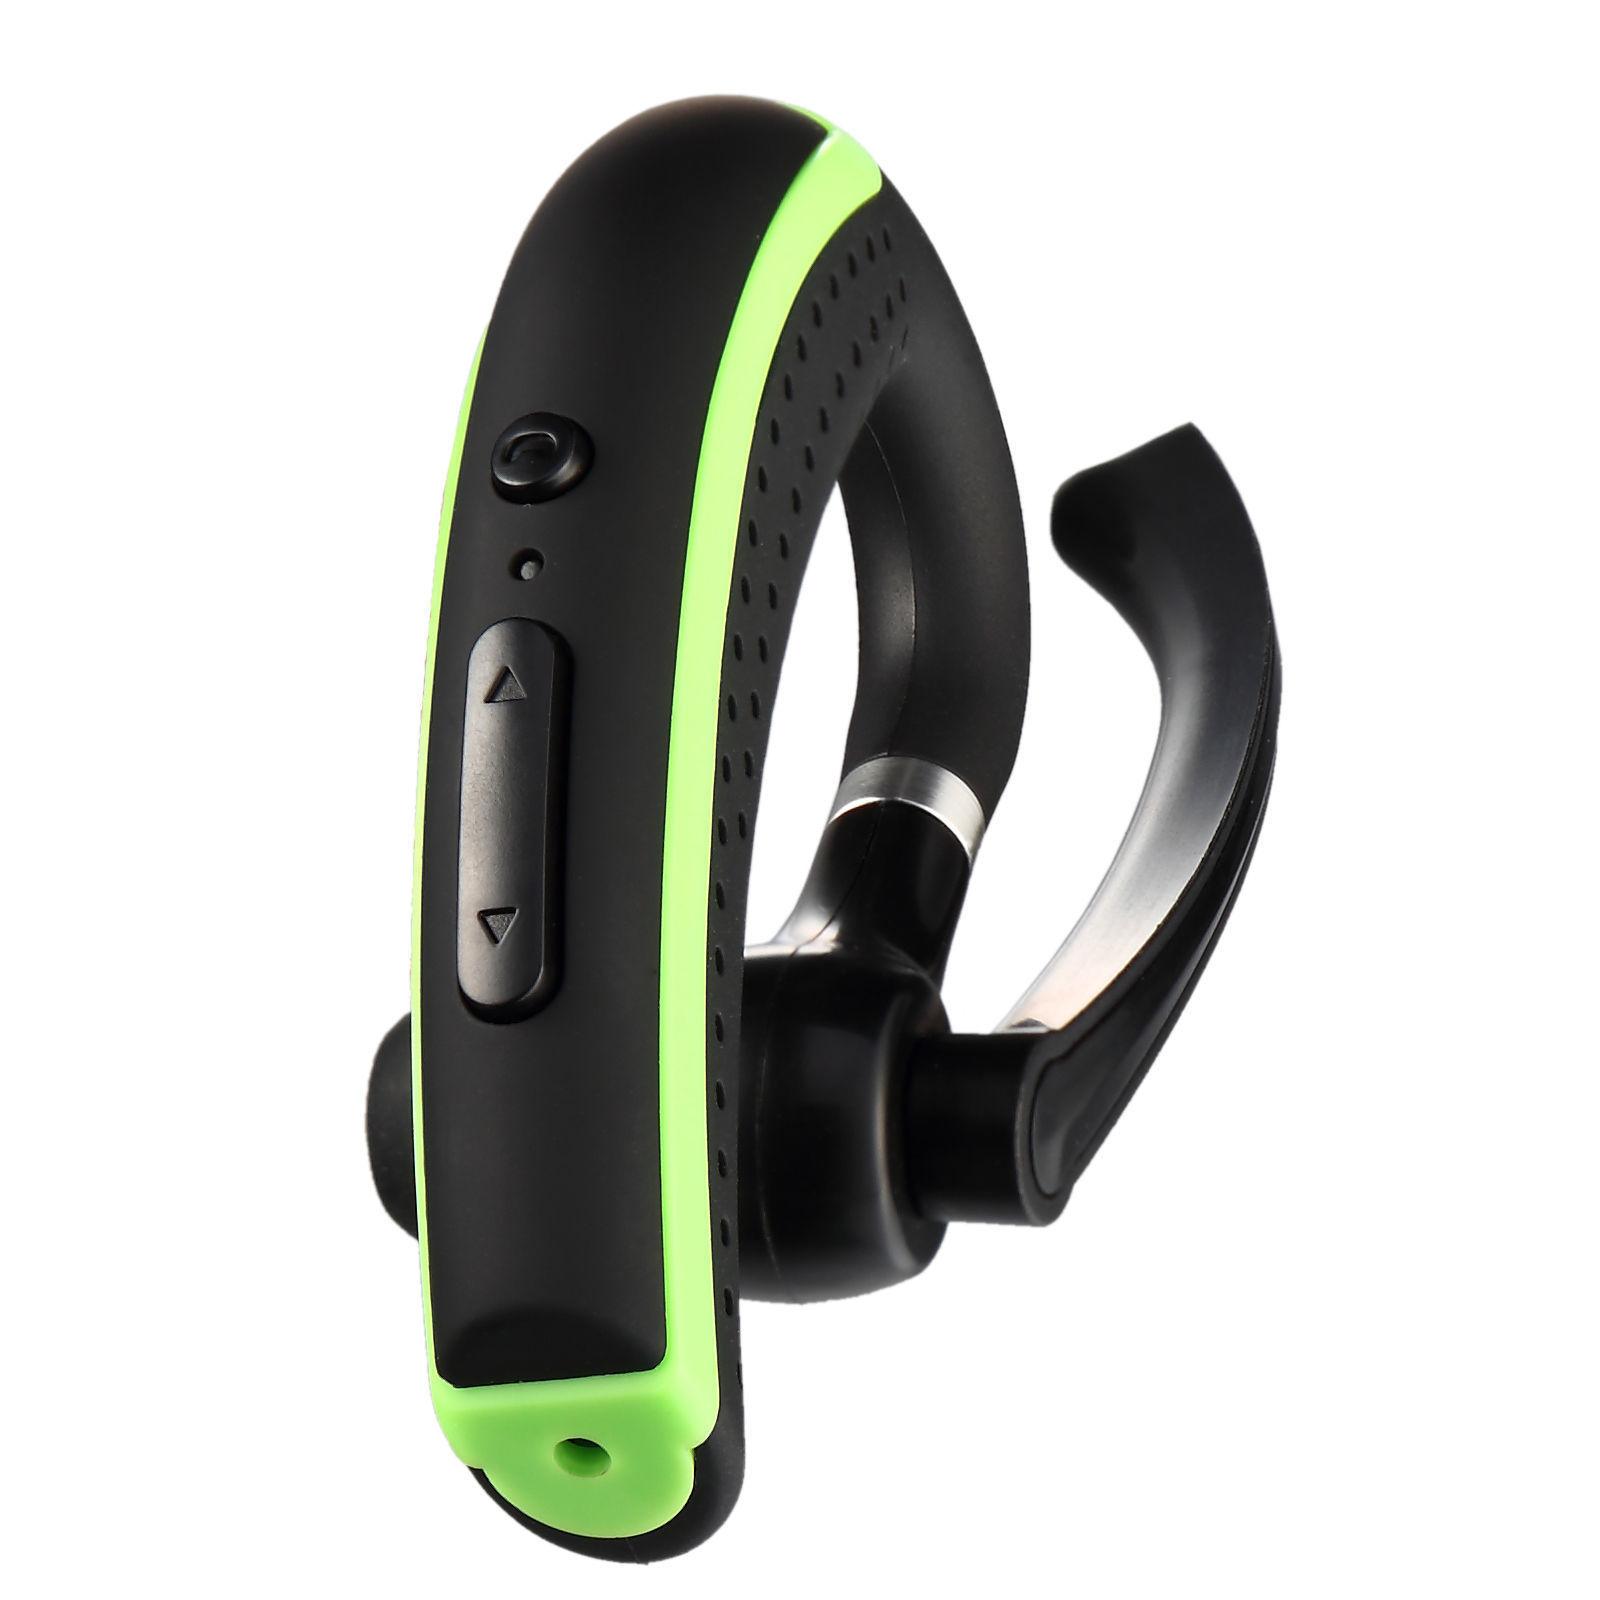 Wireless earbuds headset bluetooth - universal wireless bluetooth earbuds